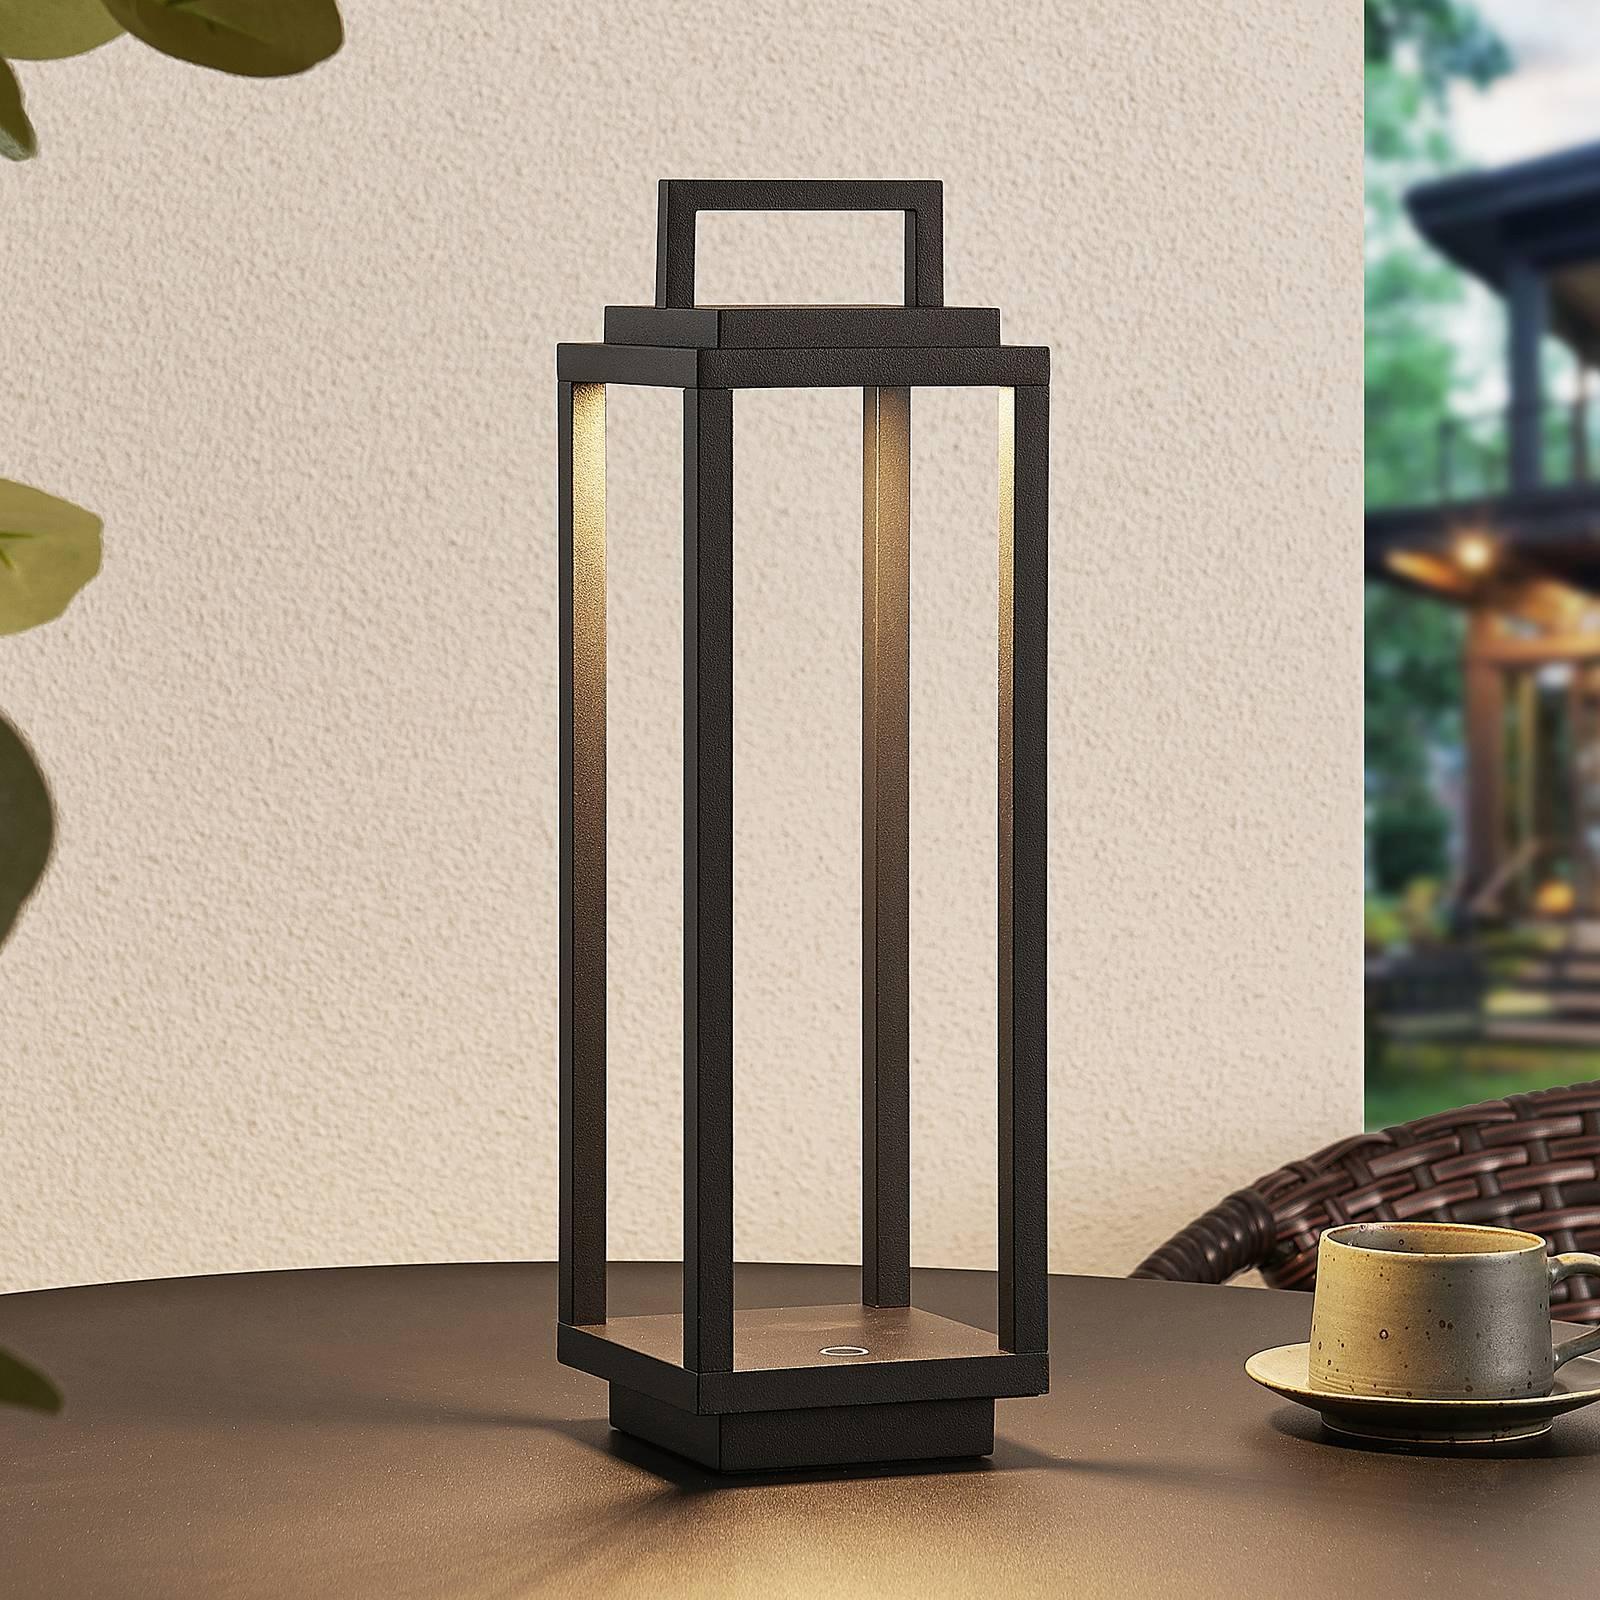 Lucande Mirina LED buitenlantaarn, USB, zwart